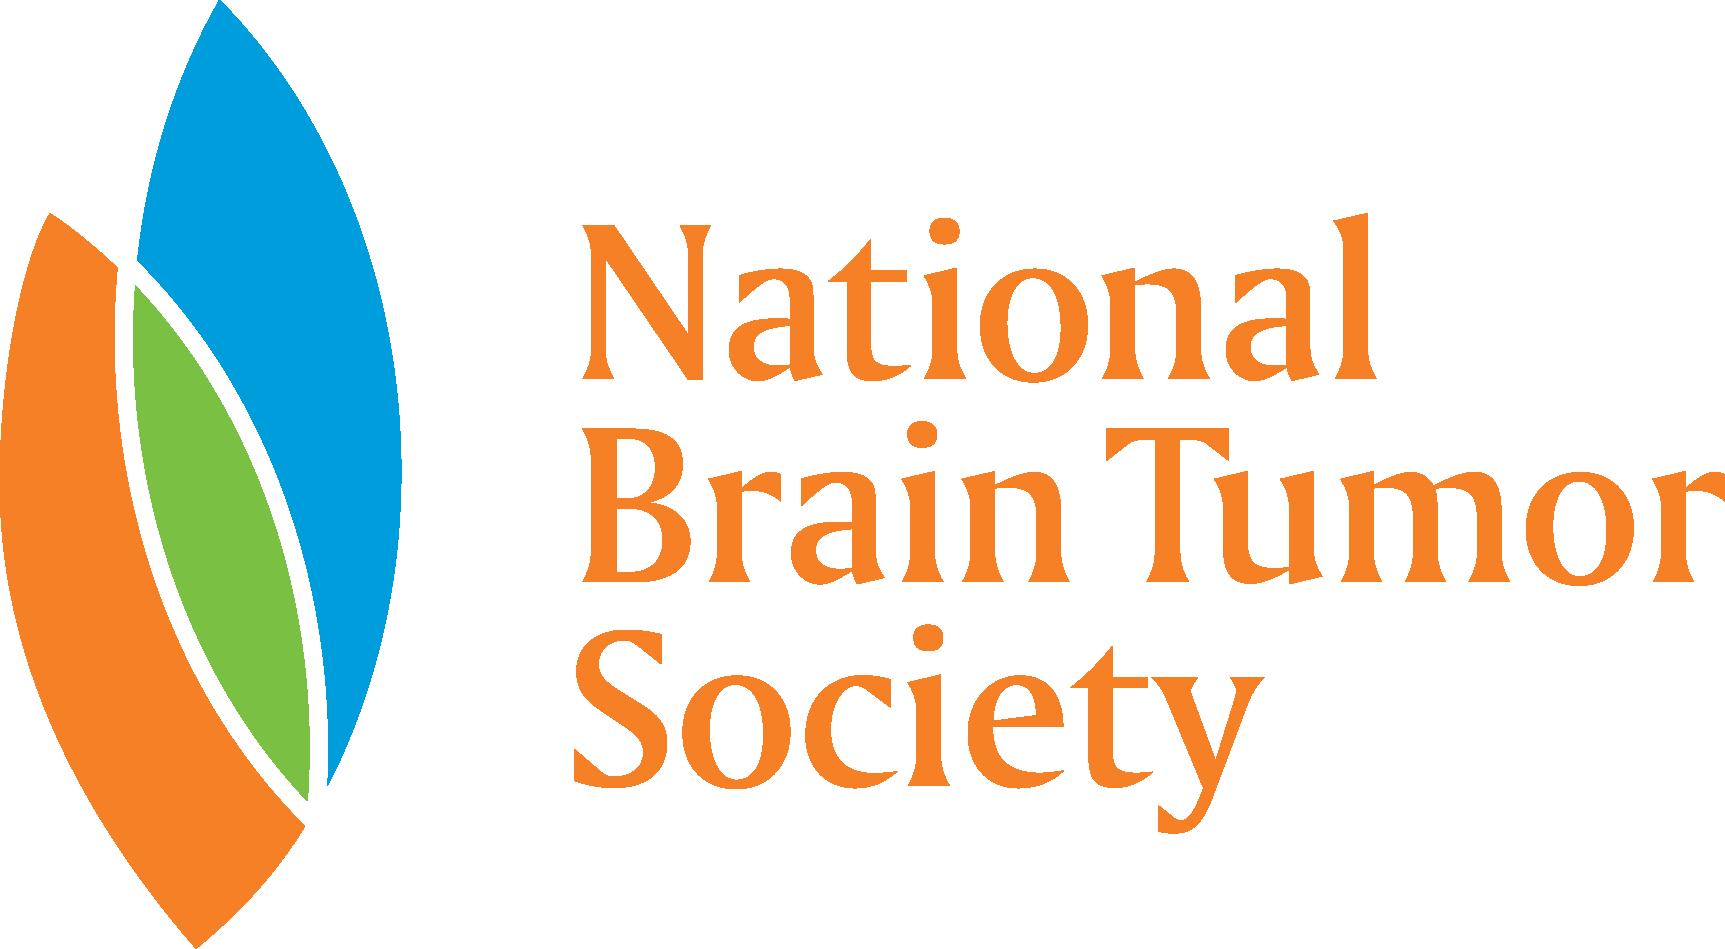 National Brain Tumor Society logo